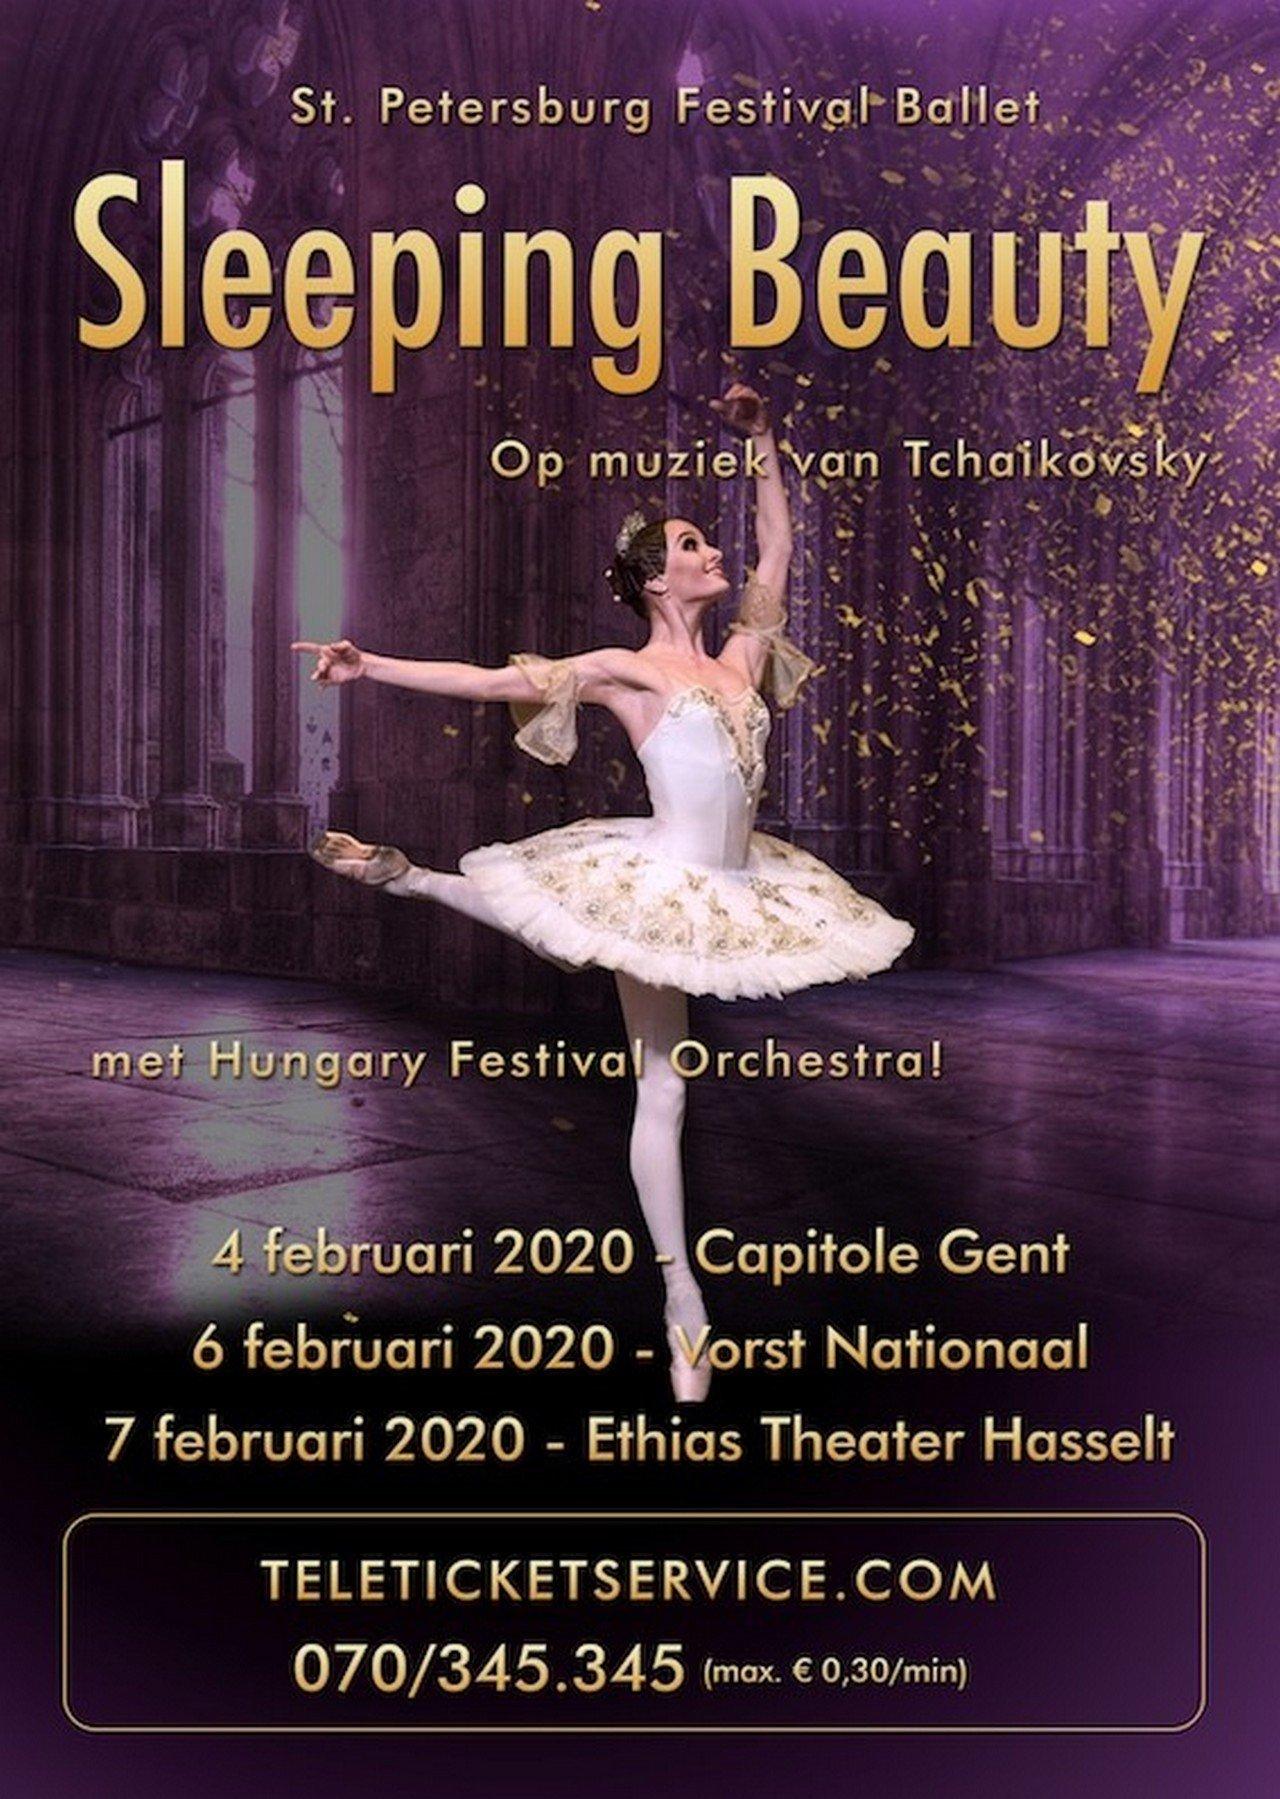 Sleeping Beauty in Gent, Vorst en Hasselt - Affiche Sleeping Beaty met Hungary festival Orchestra